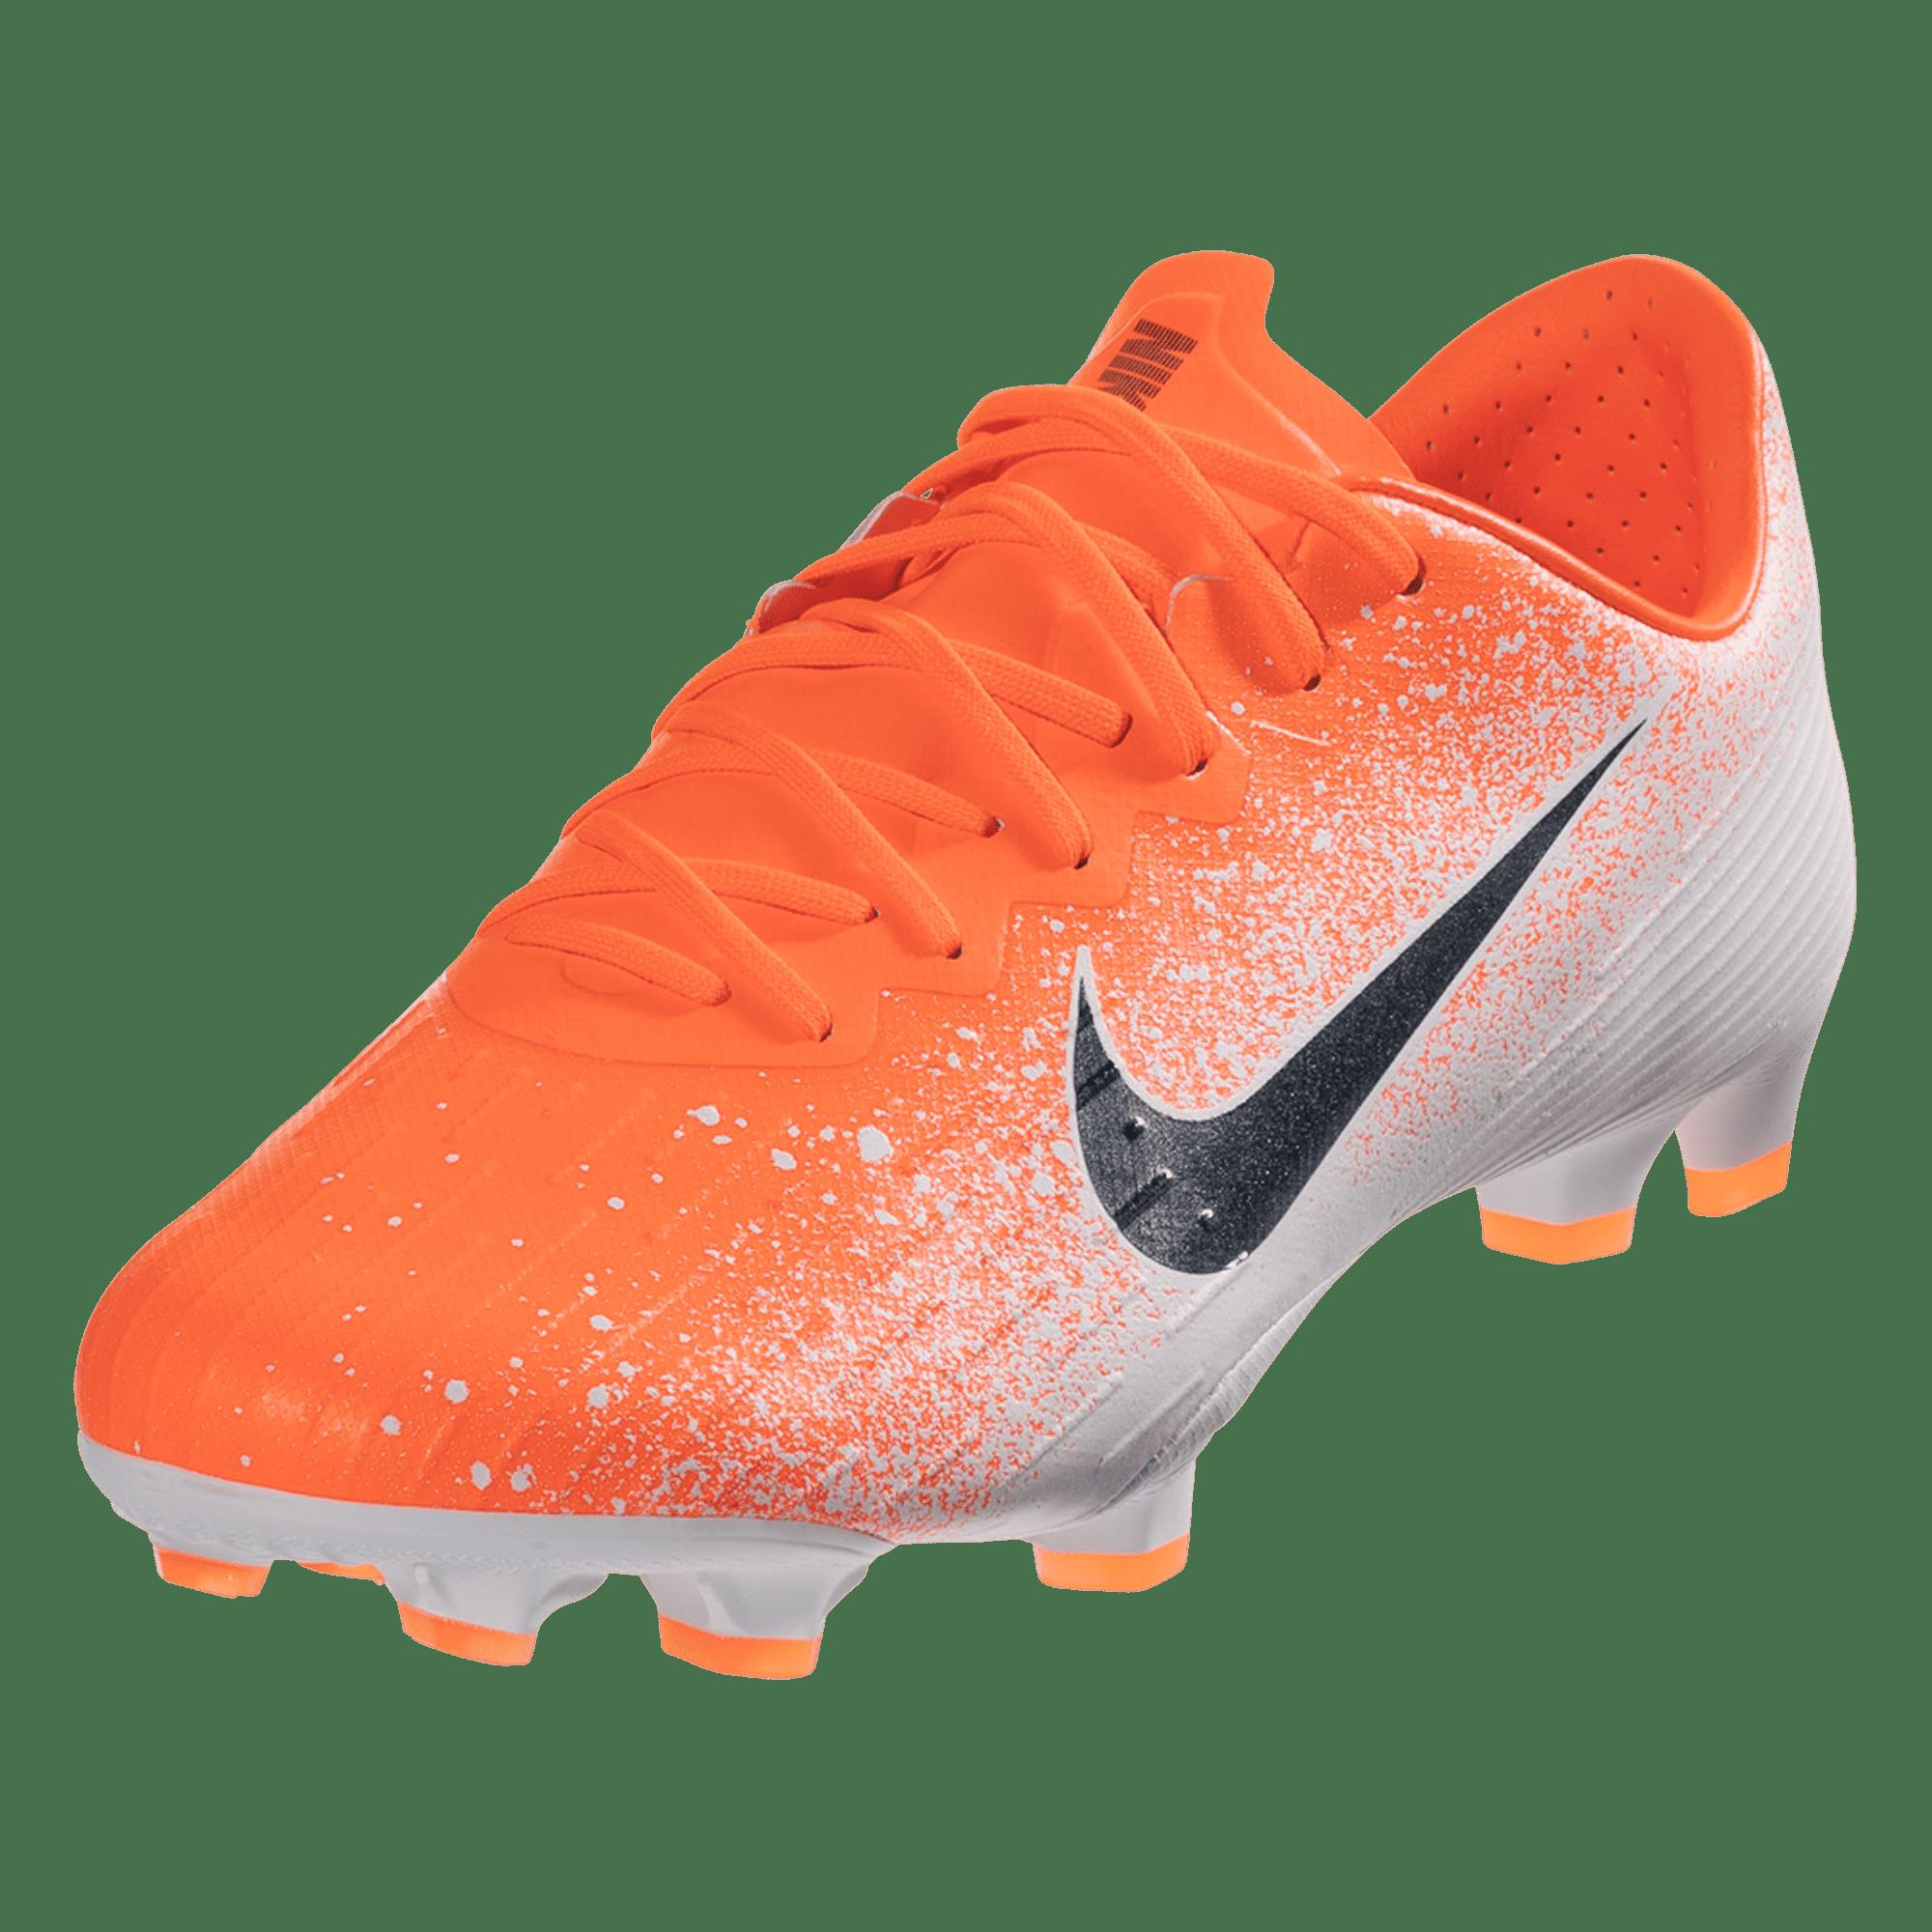 9cbfd4c6410d Nike Mercurial Vapor XII Pro FG Soccer Cleat – Hyper Crimson / Black / White